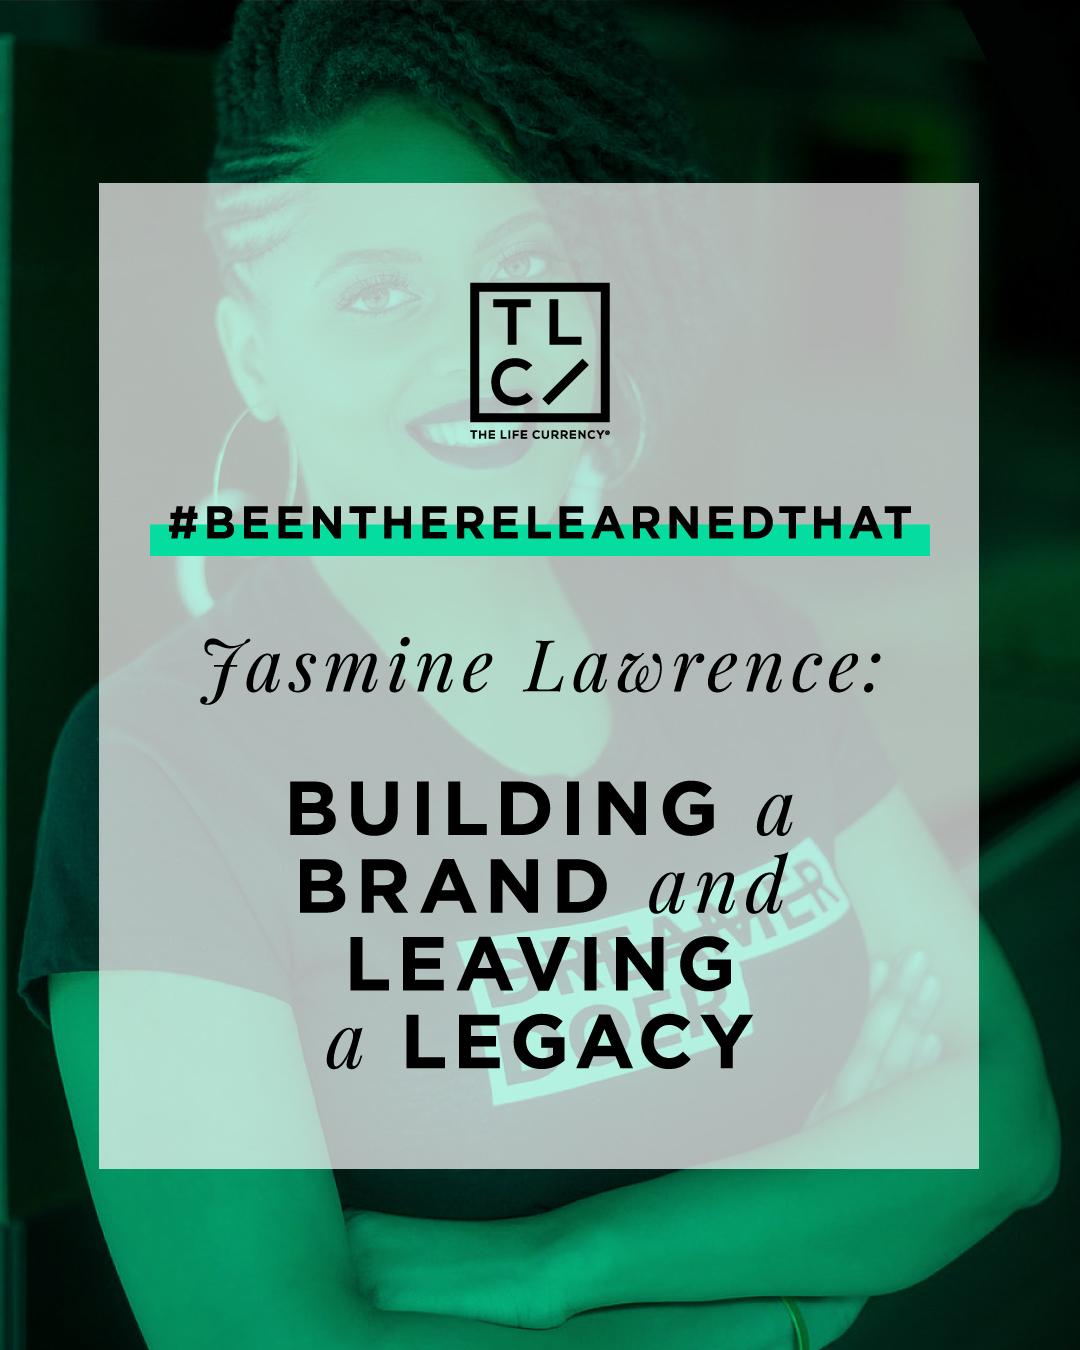 jasmine-lawrence_PIN.jpg